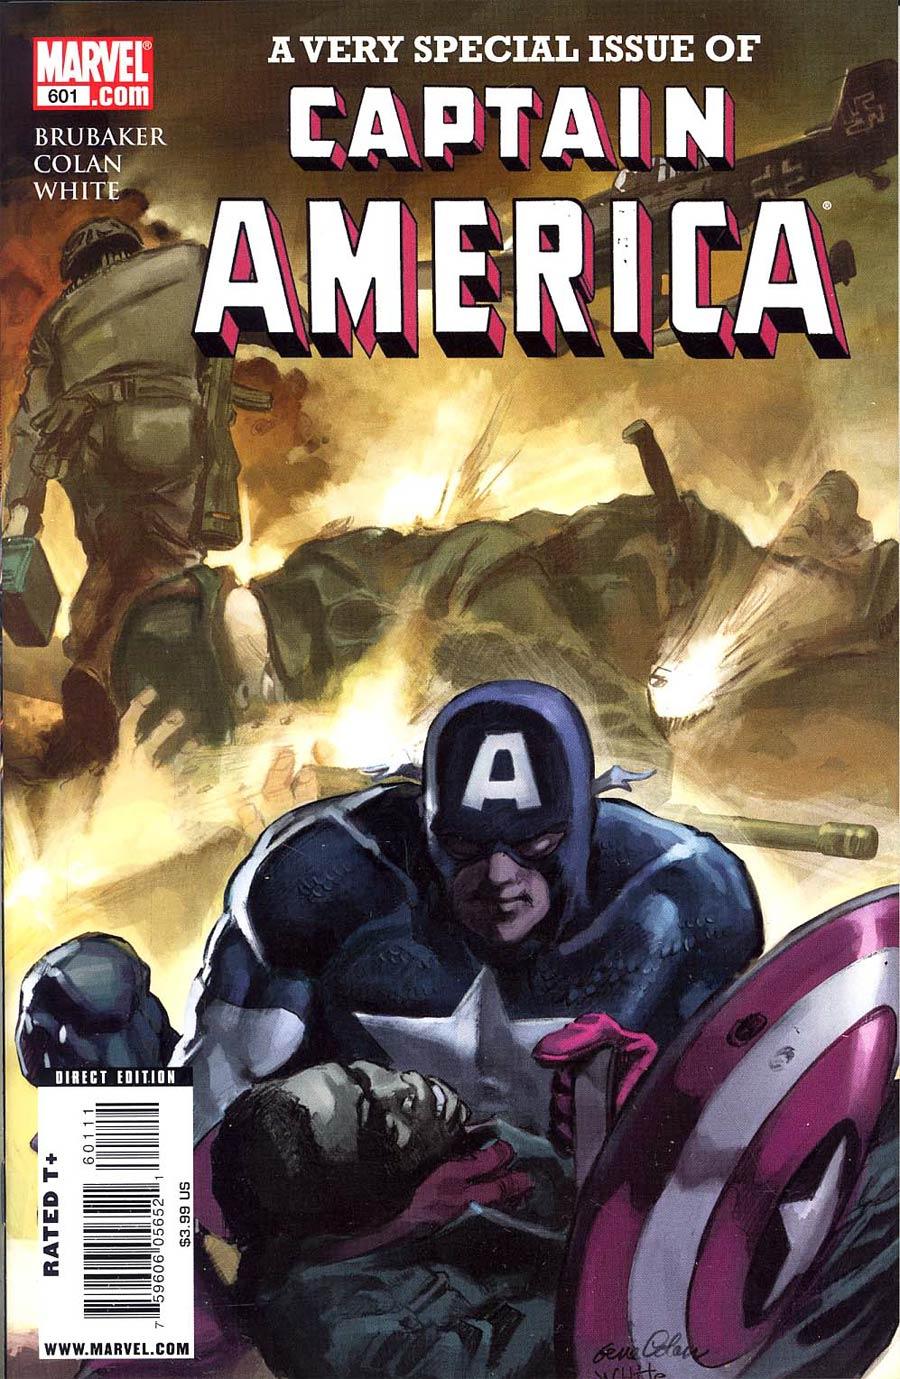 Captain America Vol 5 #601 Cover A 1st Ptg Regular Color Edition